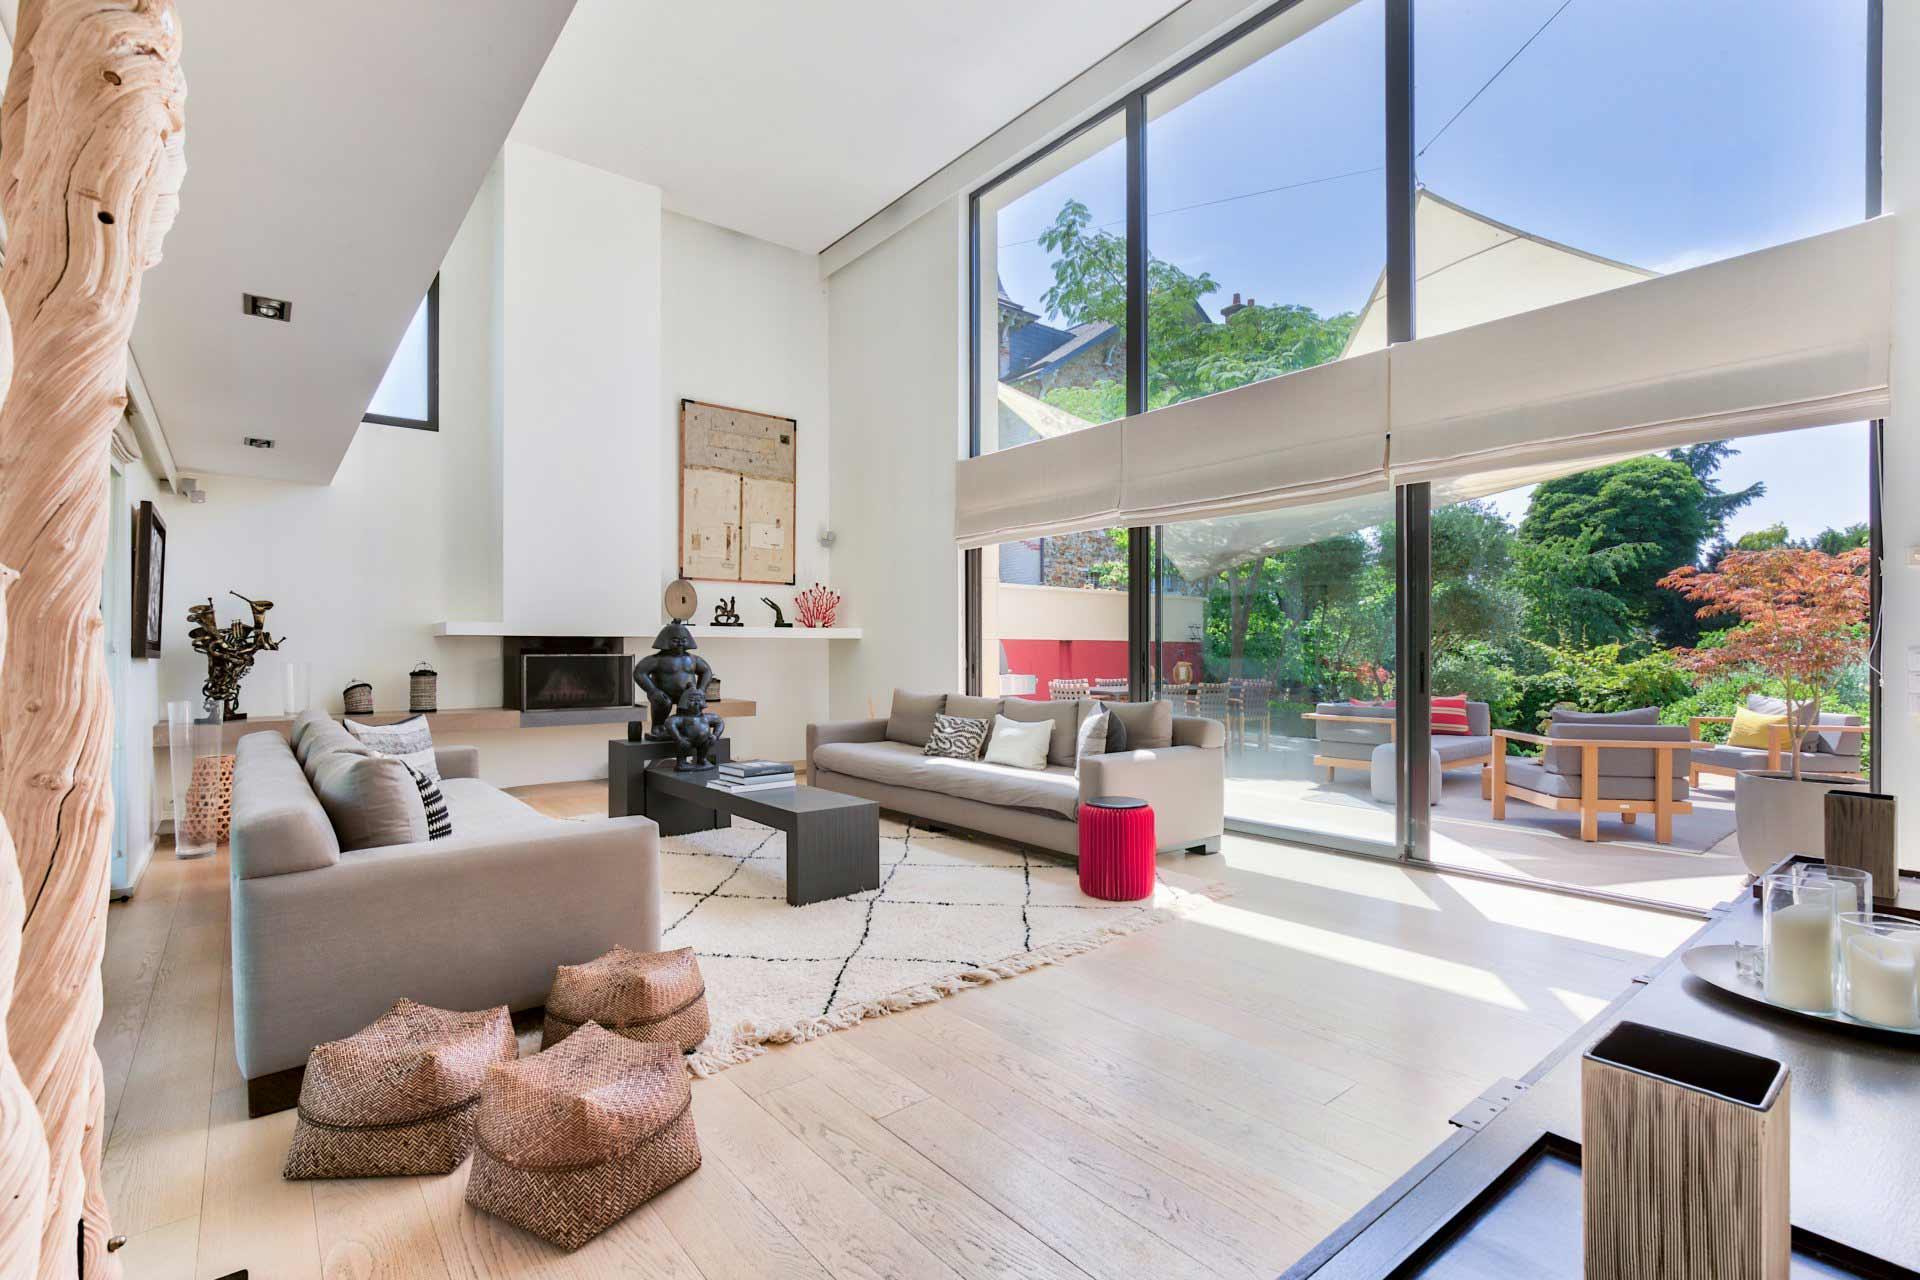 Le Perreux-sur-Marne - France - House , 6 rooms, 4 bedrooms - Slideshow Picture 2